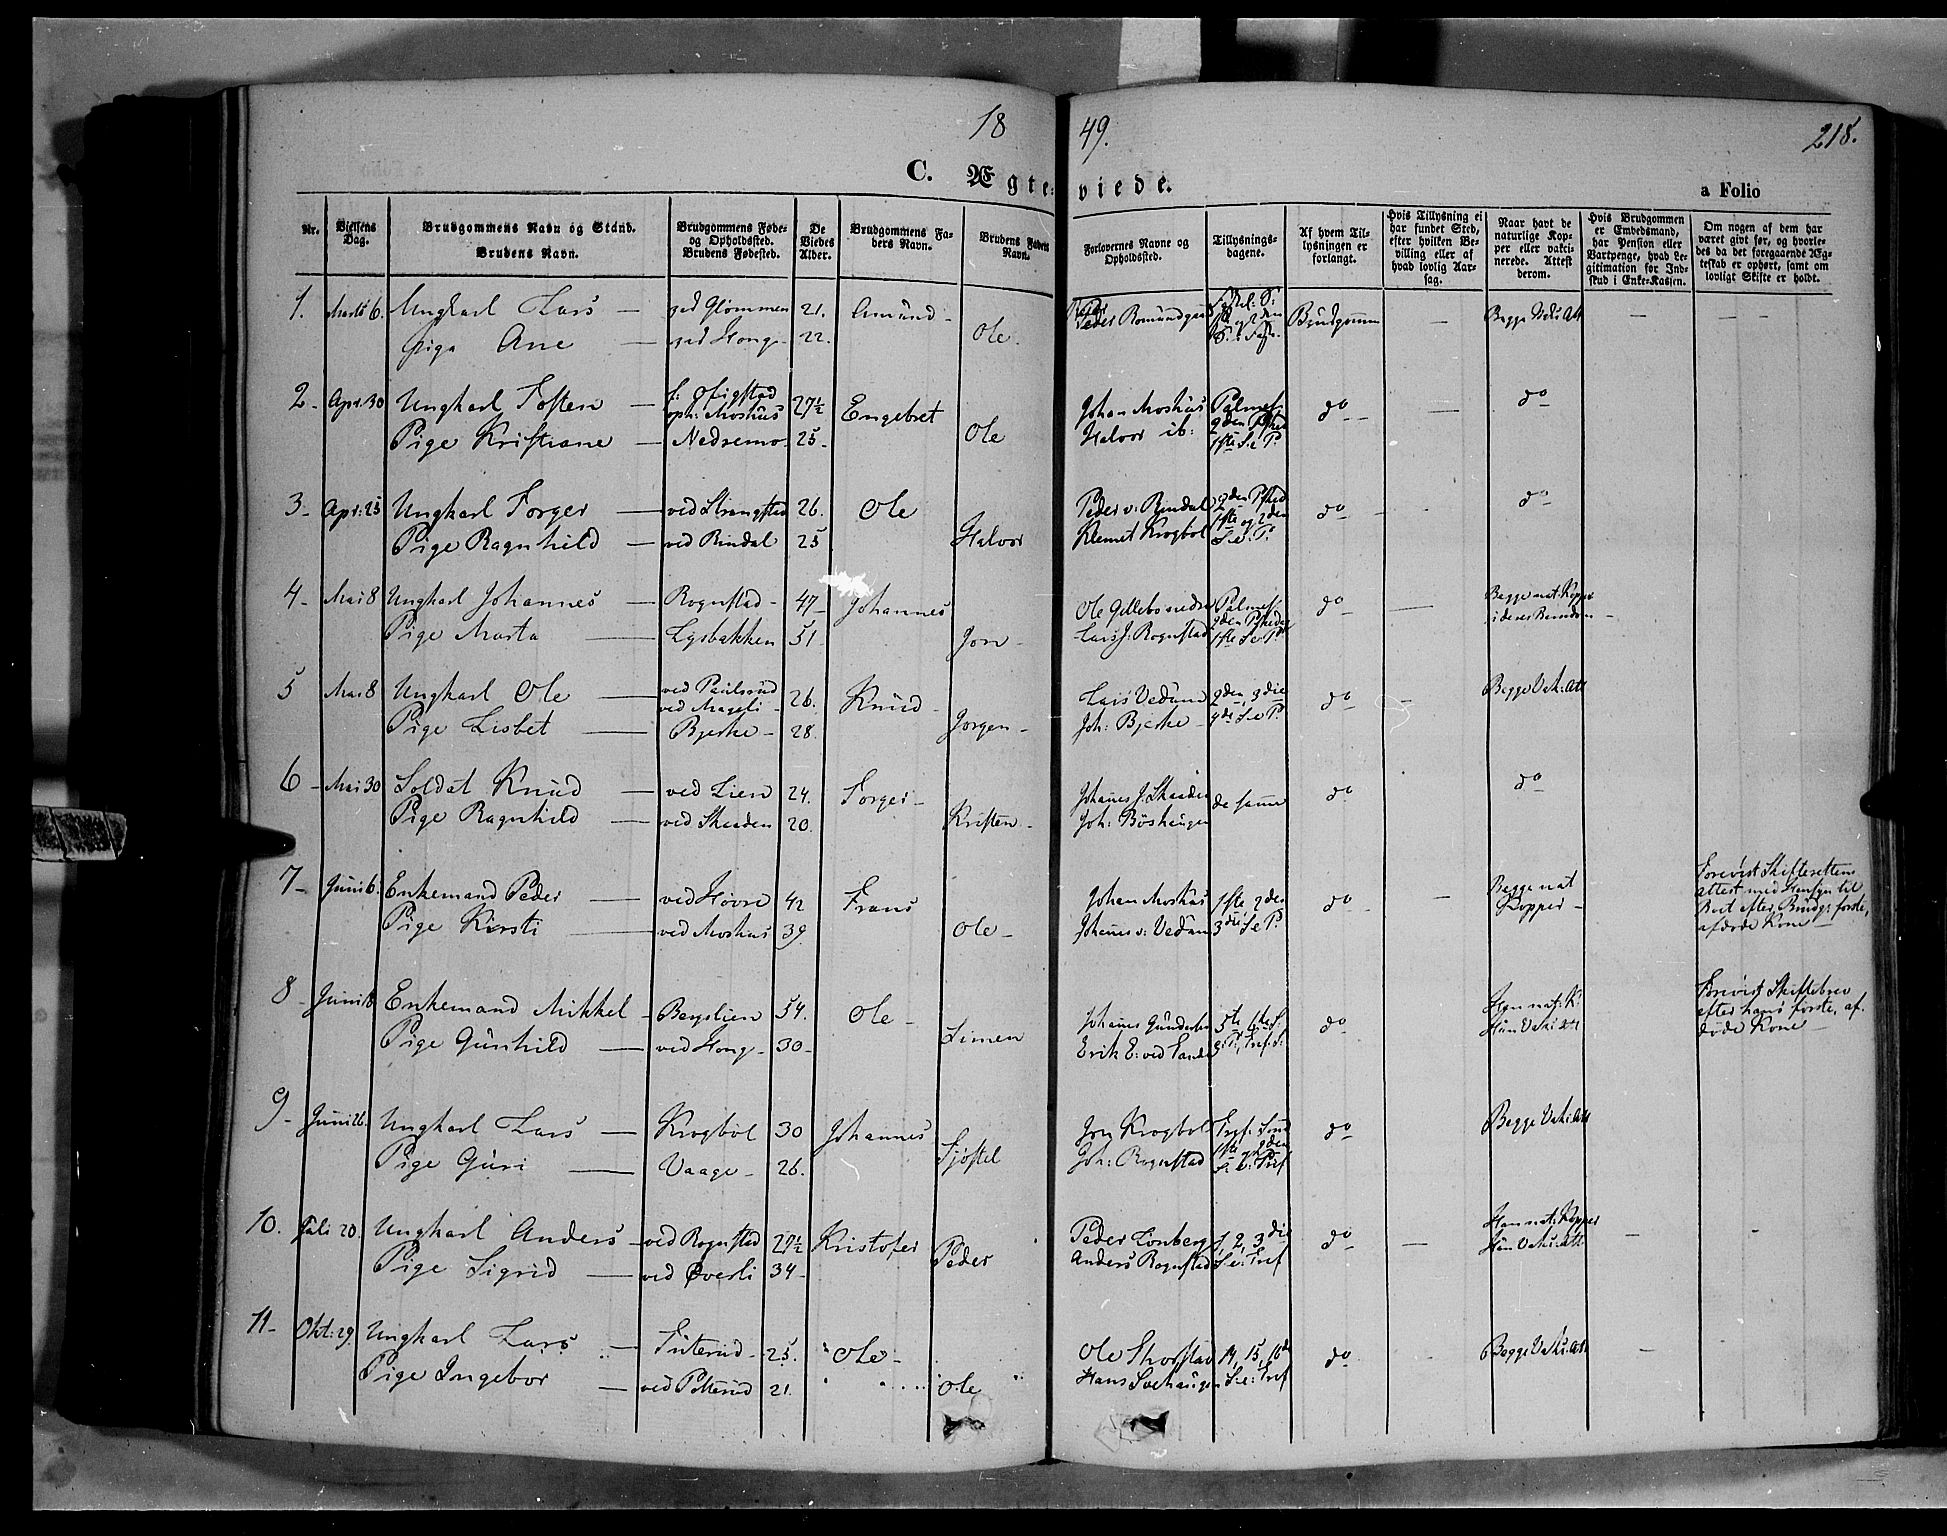 SAH, Øyer prestekontor, Ministerialbok nr. 5, 1842-1857, s. 218